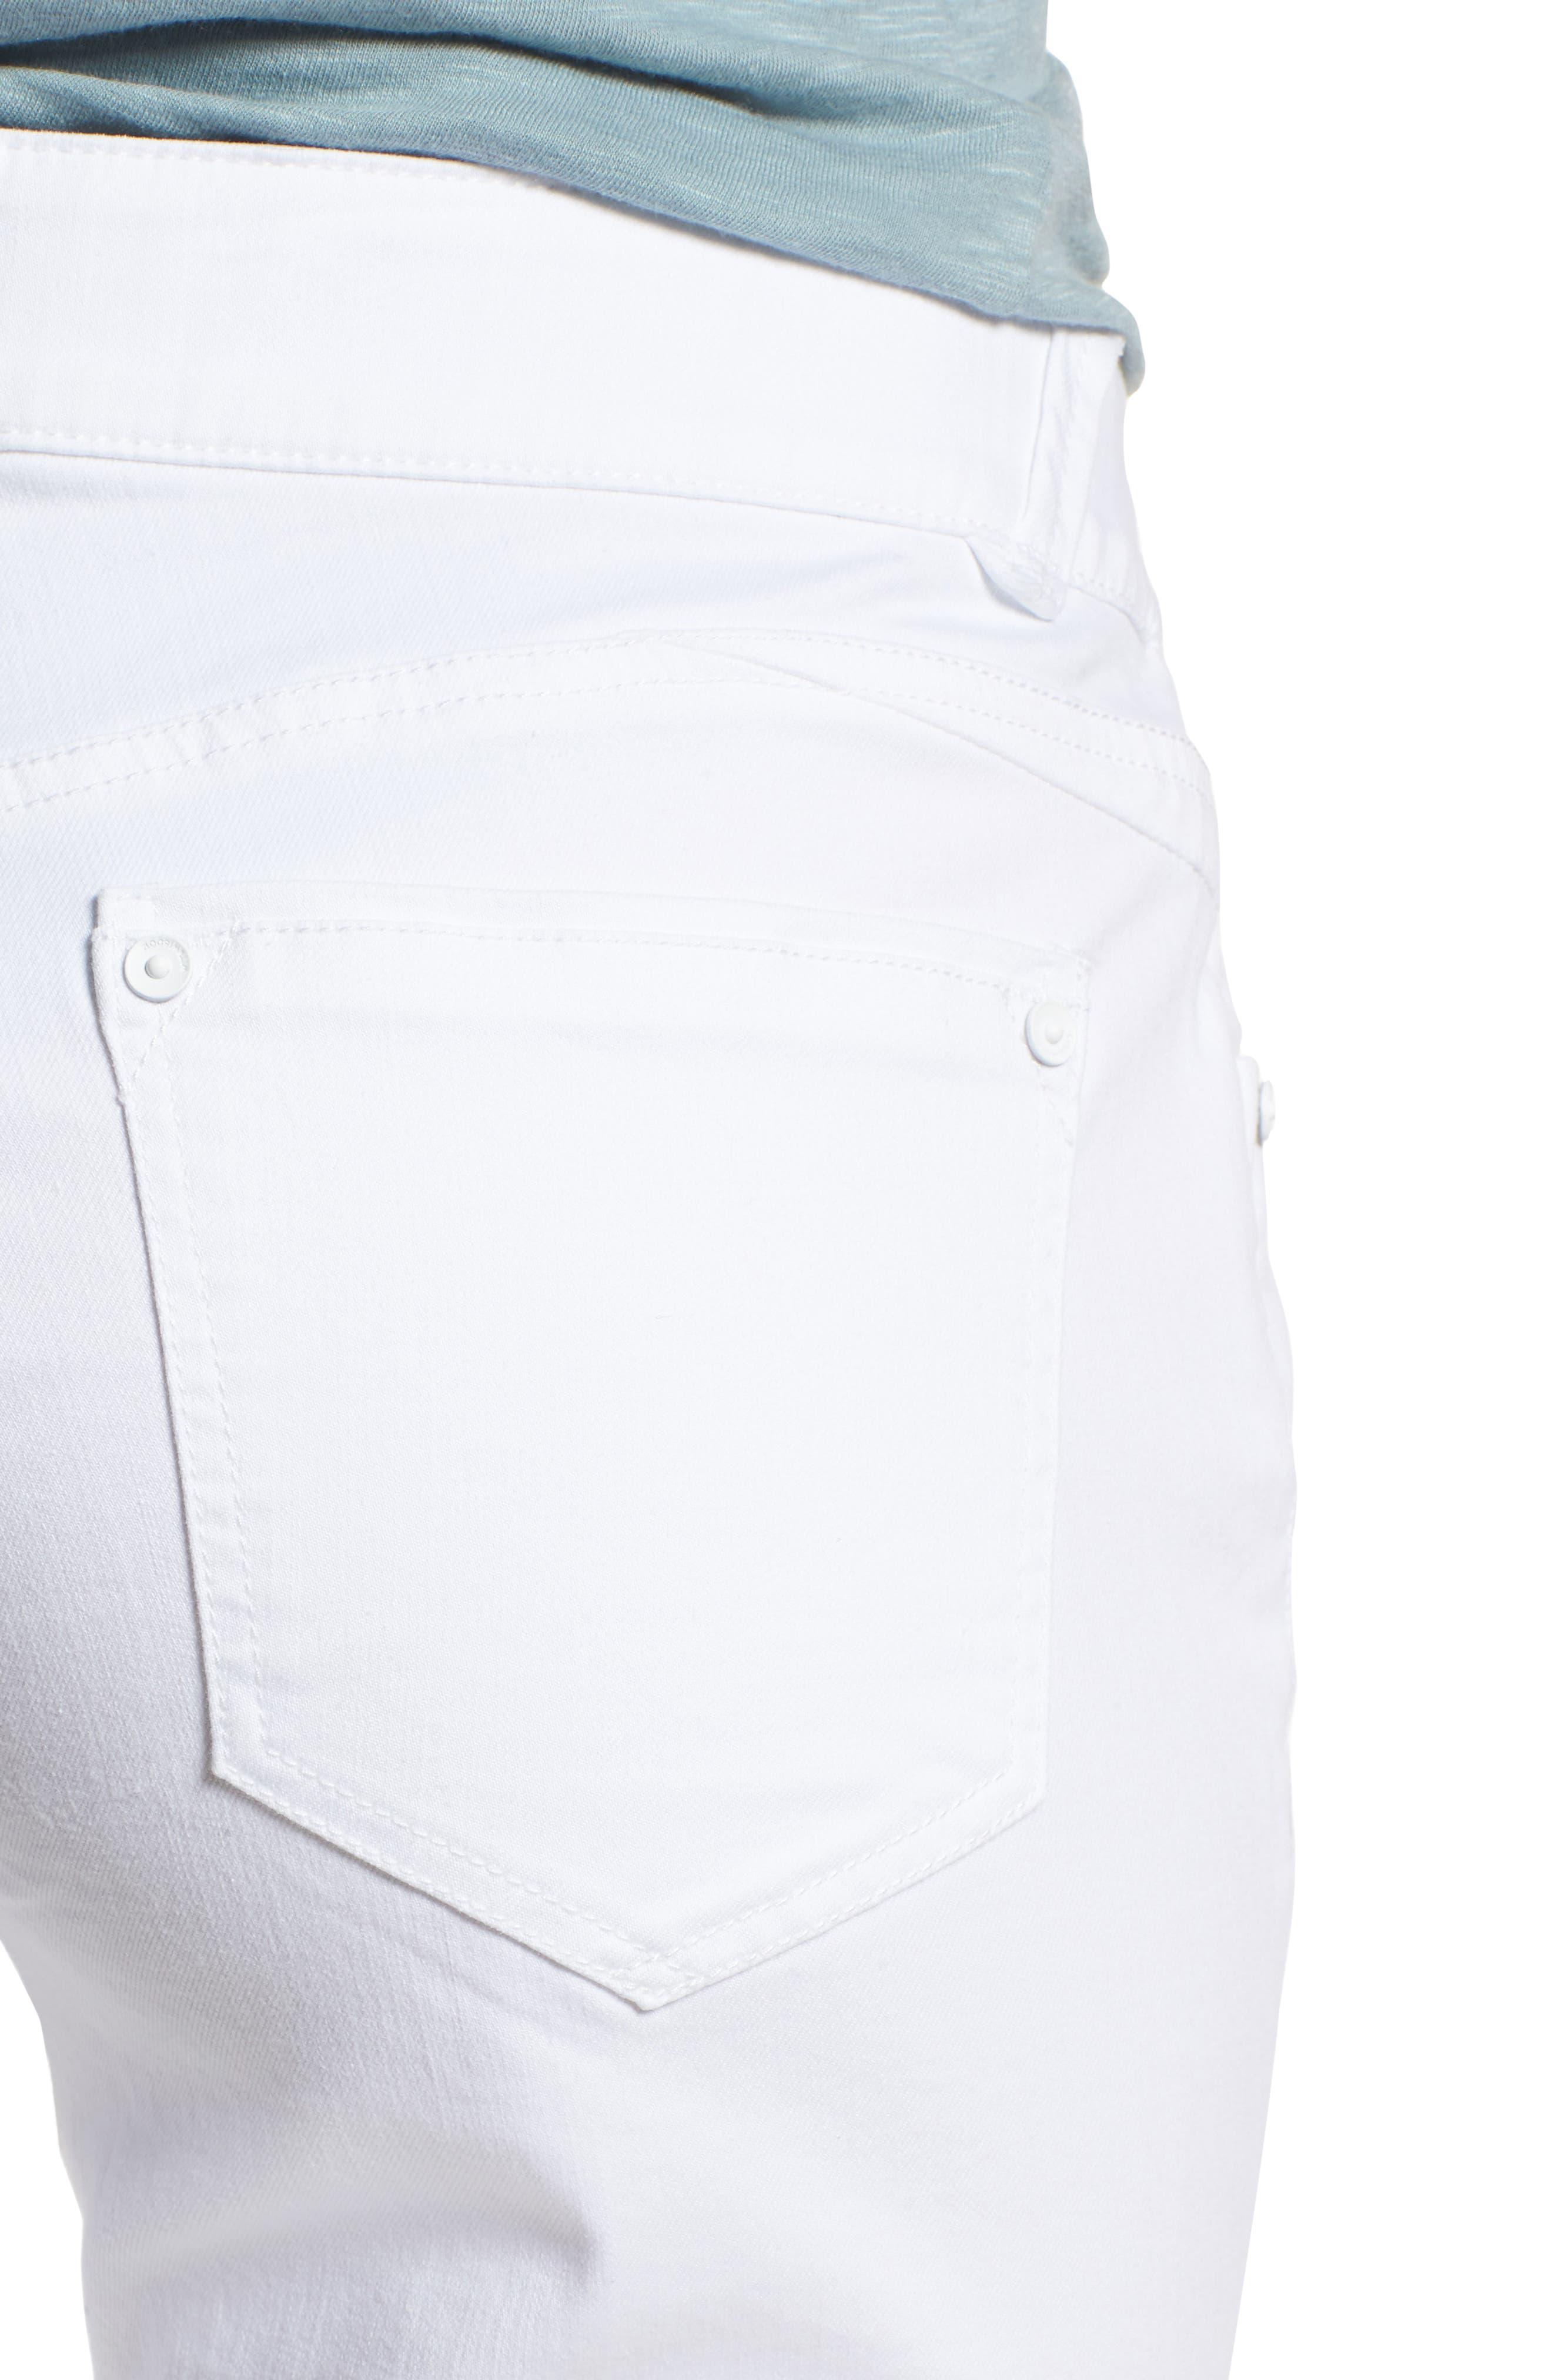 Ab-solution White Bermuda Shorts,                             Alternate thumbnail 4, color,                             106